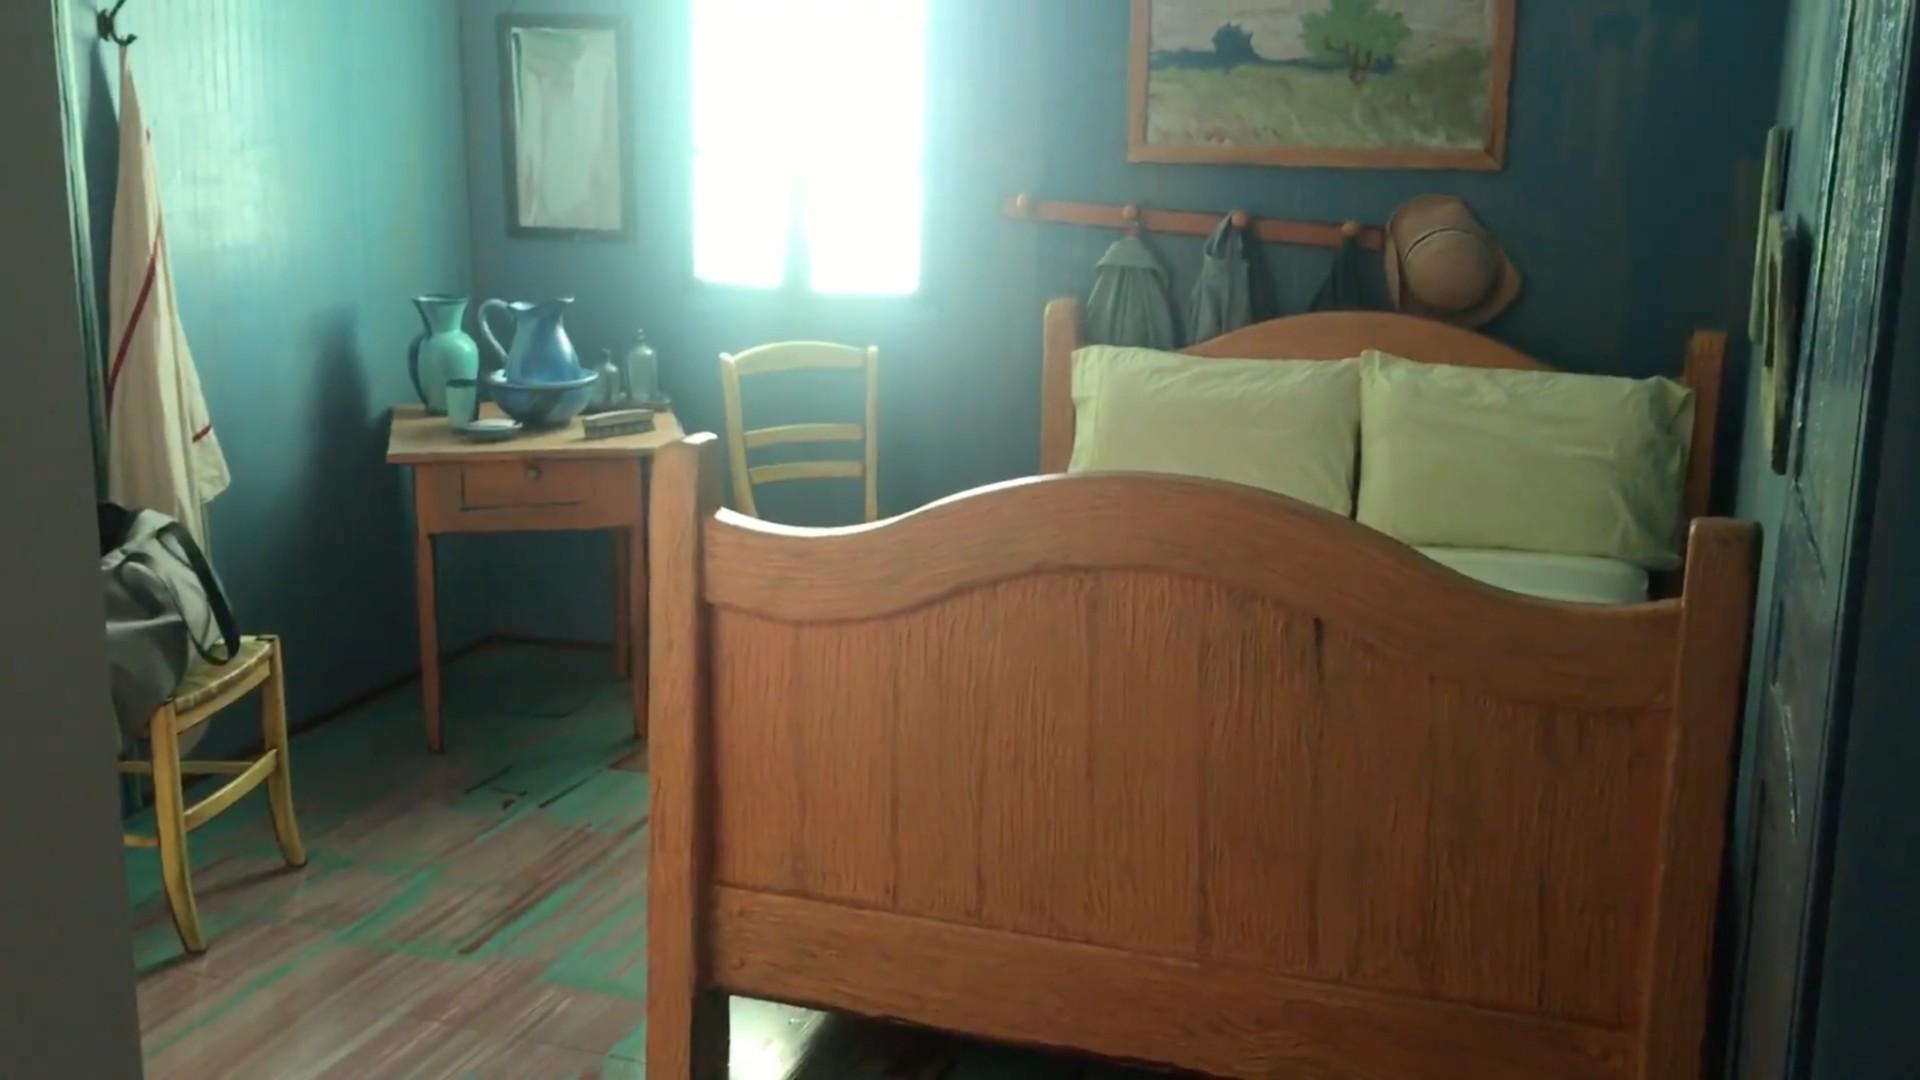 Take A Look Inside Chicago S Van Gogh Airbnb Rental Chicago Tribune